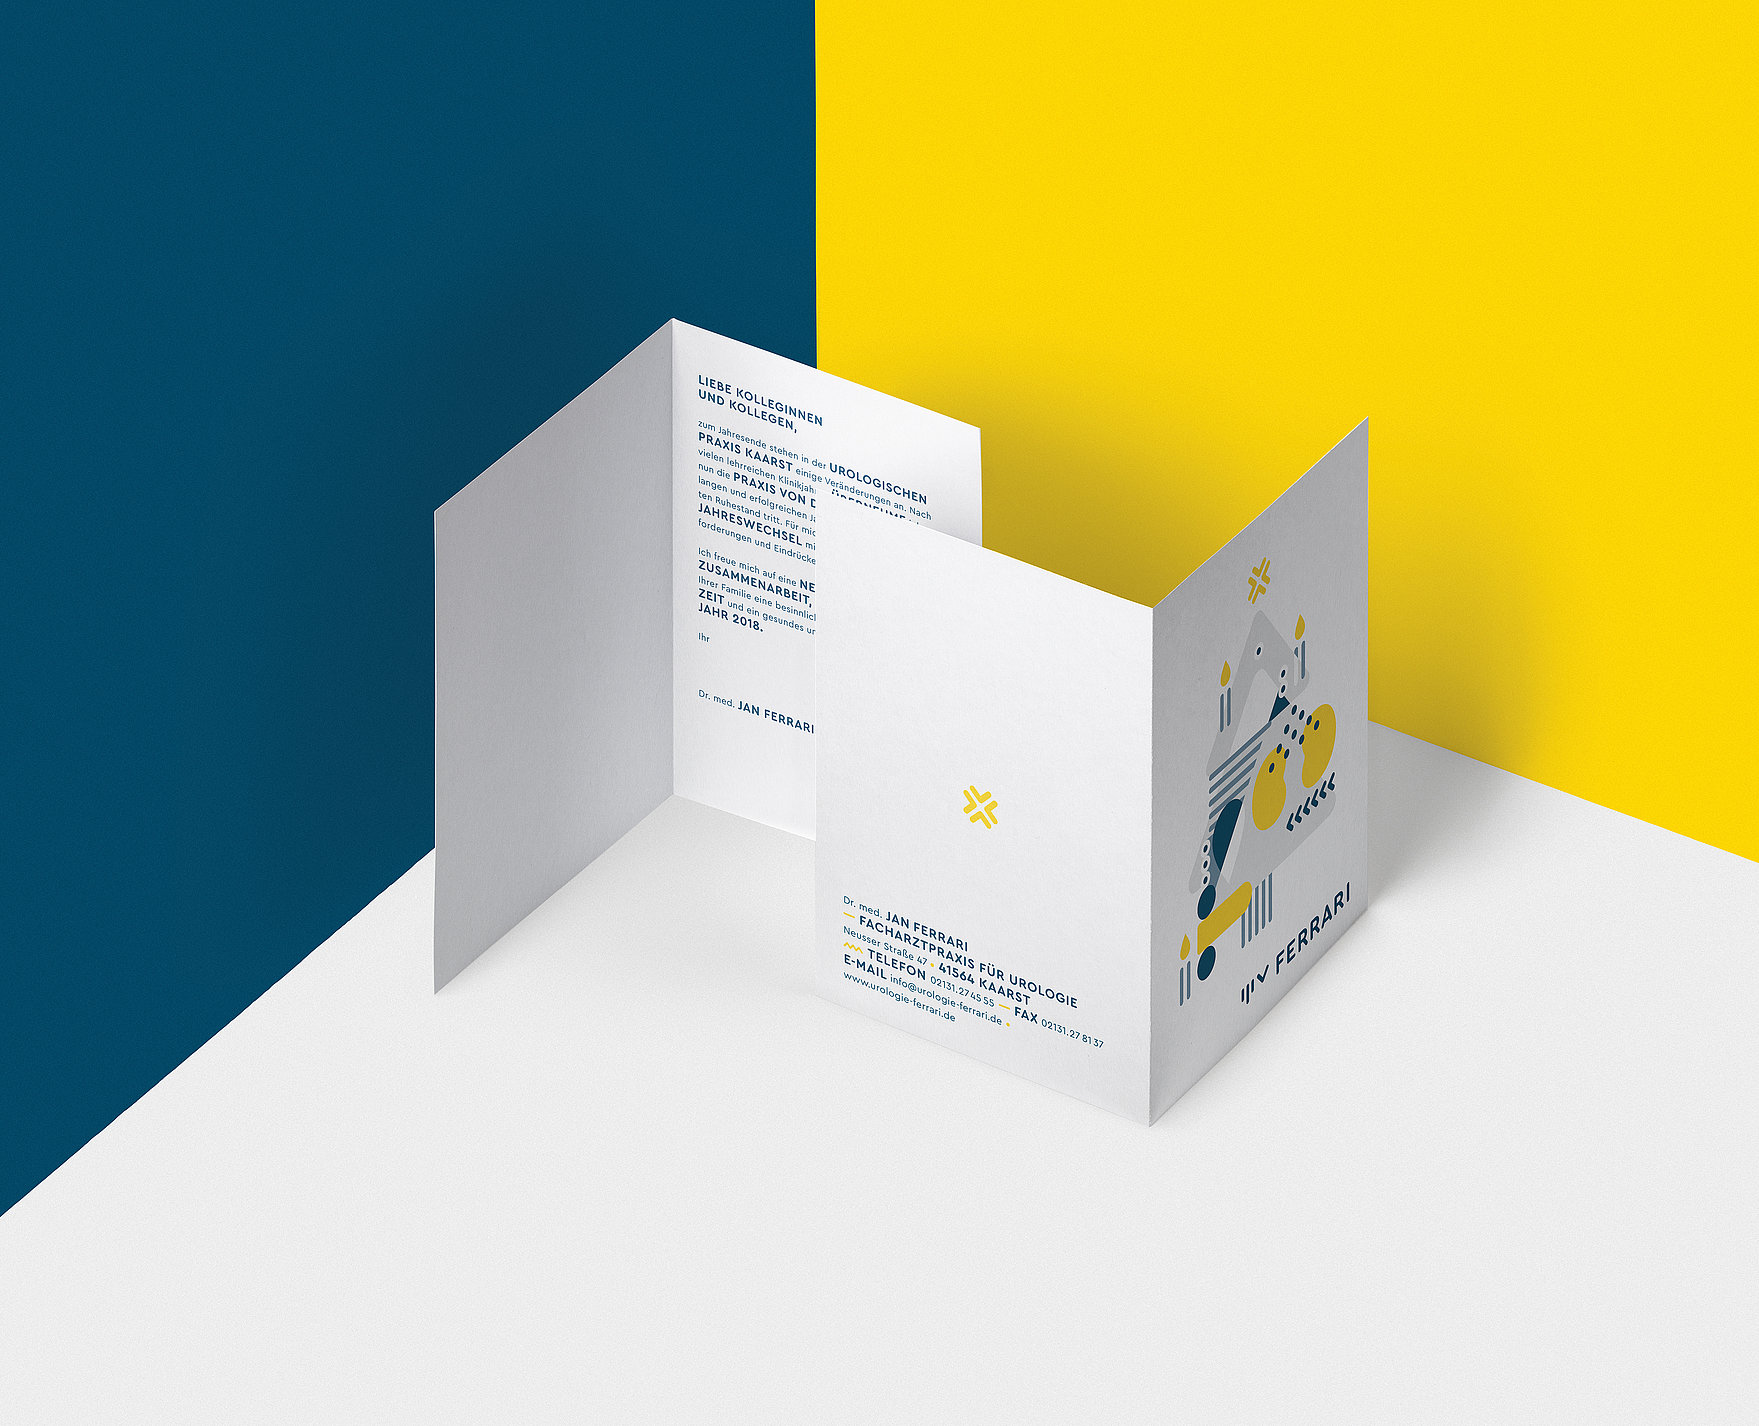 From Kidney to Bladder | Red Dot Design Award